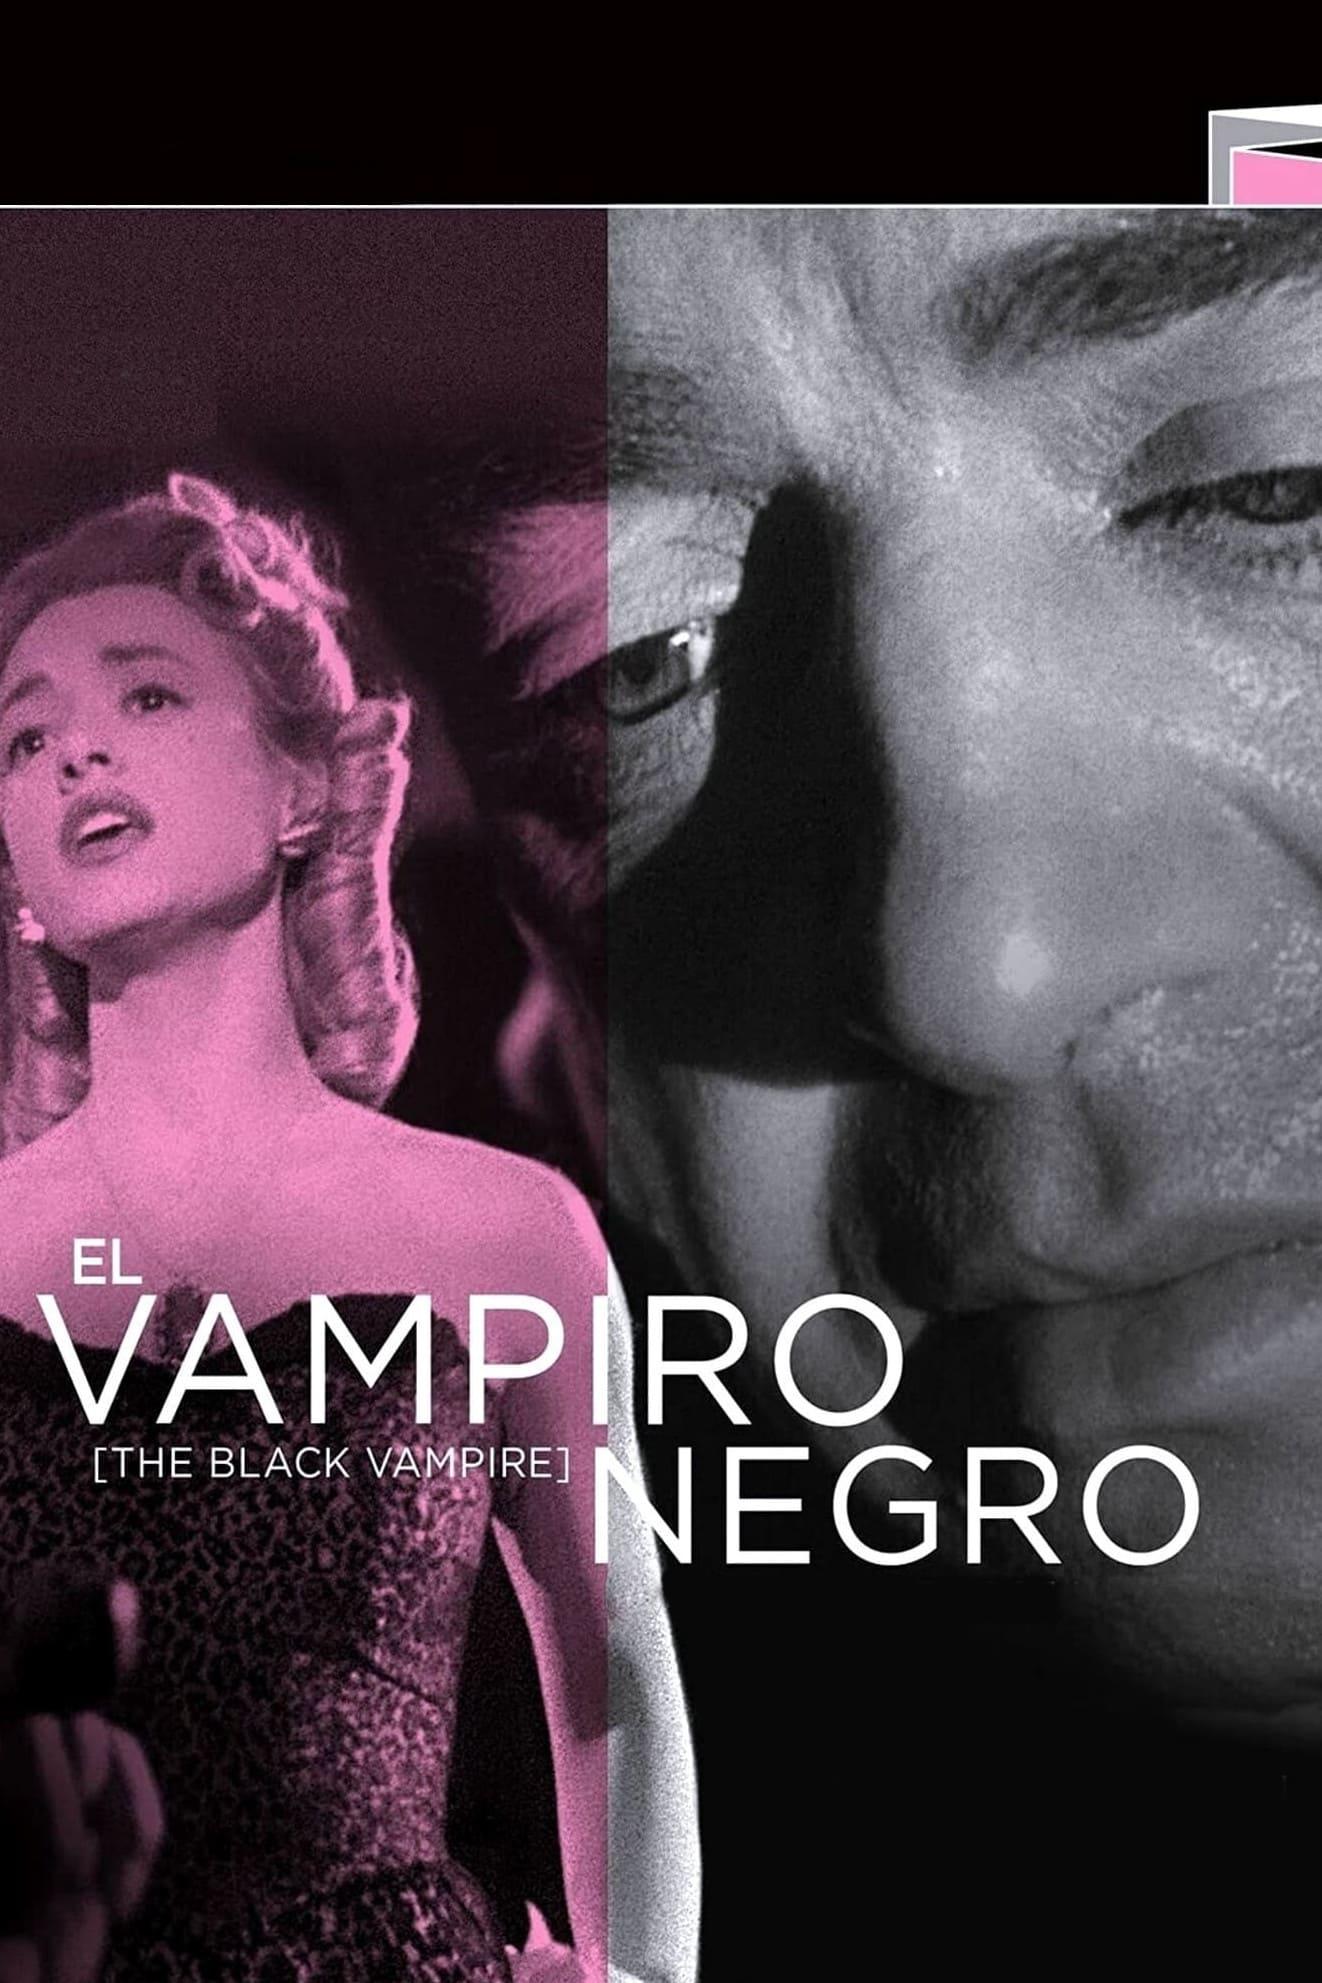 The Black Vampire